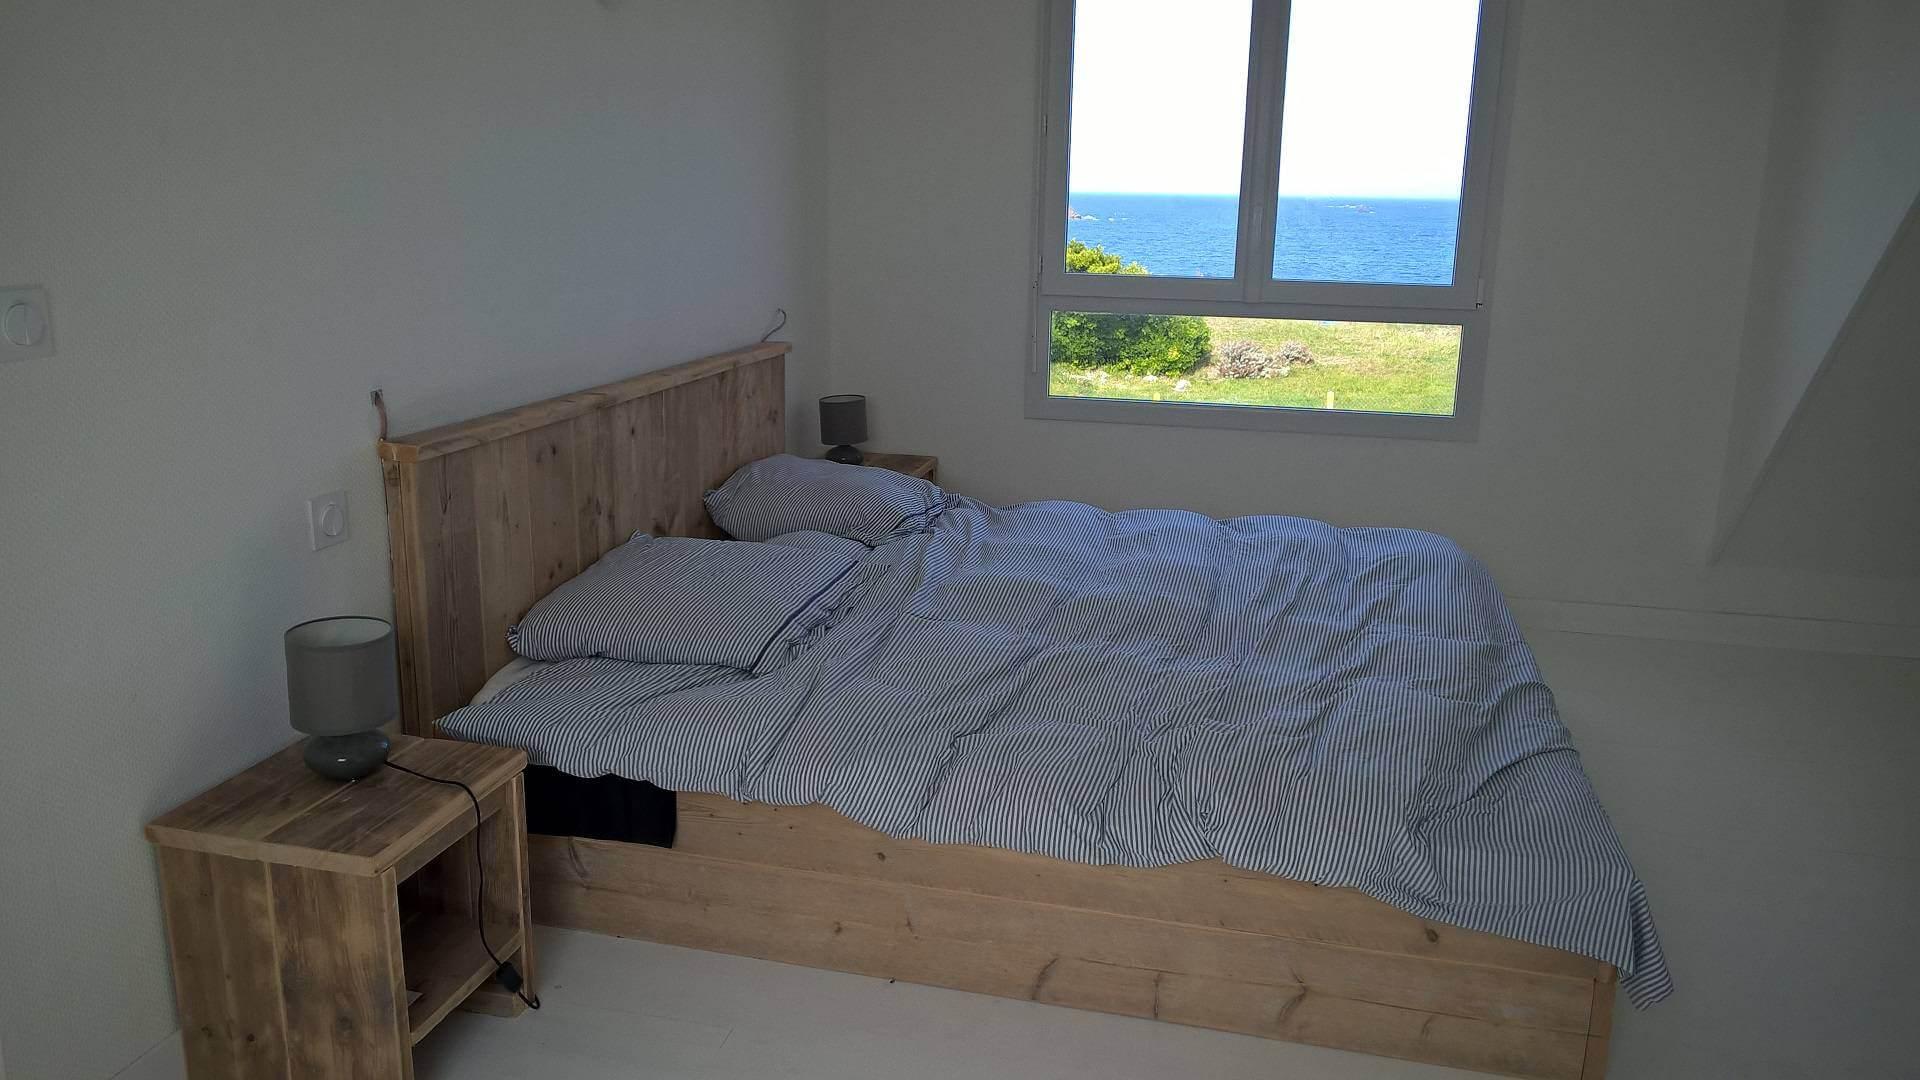 Location Kerlouan Chambre vue sur mer